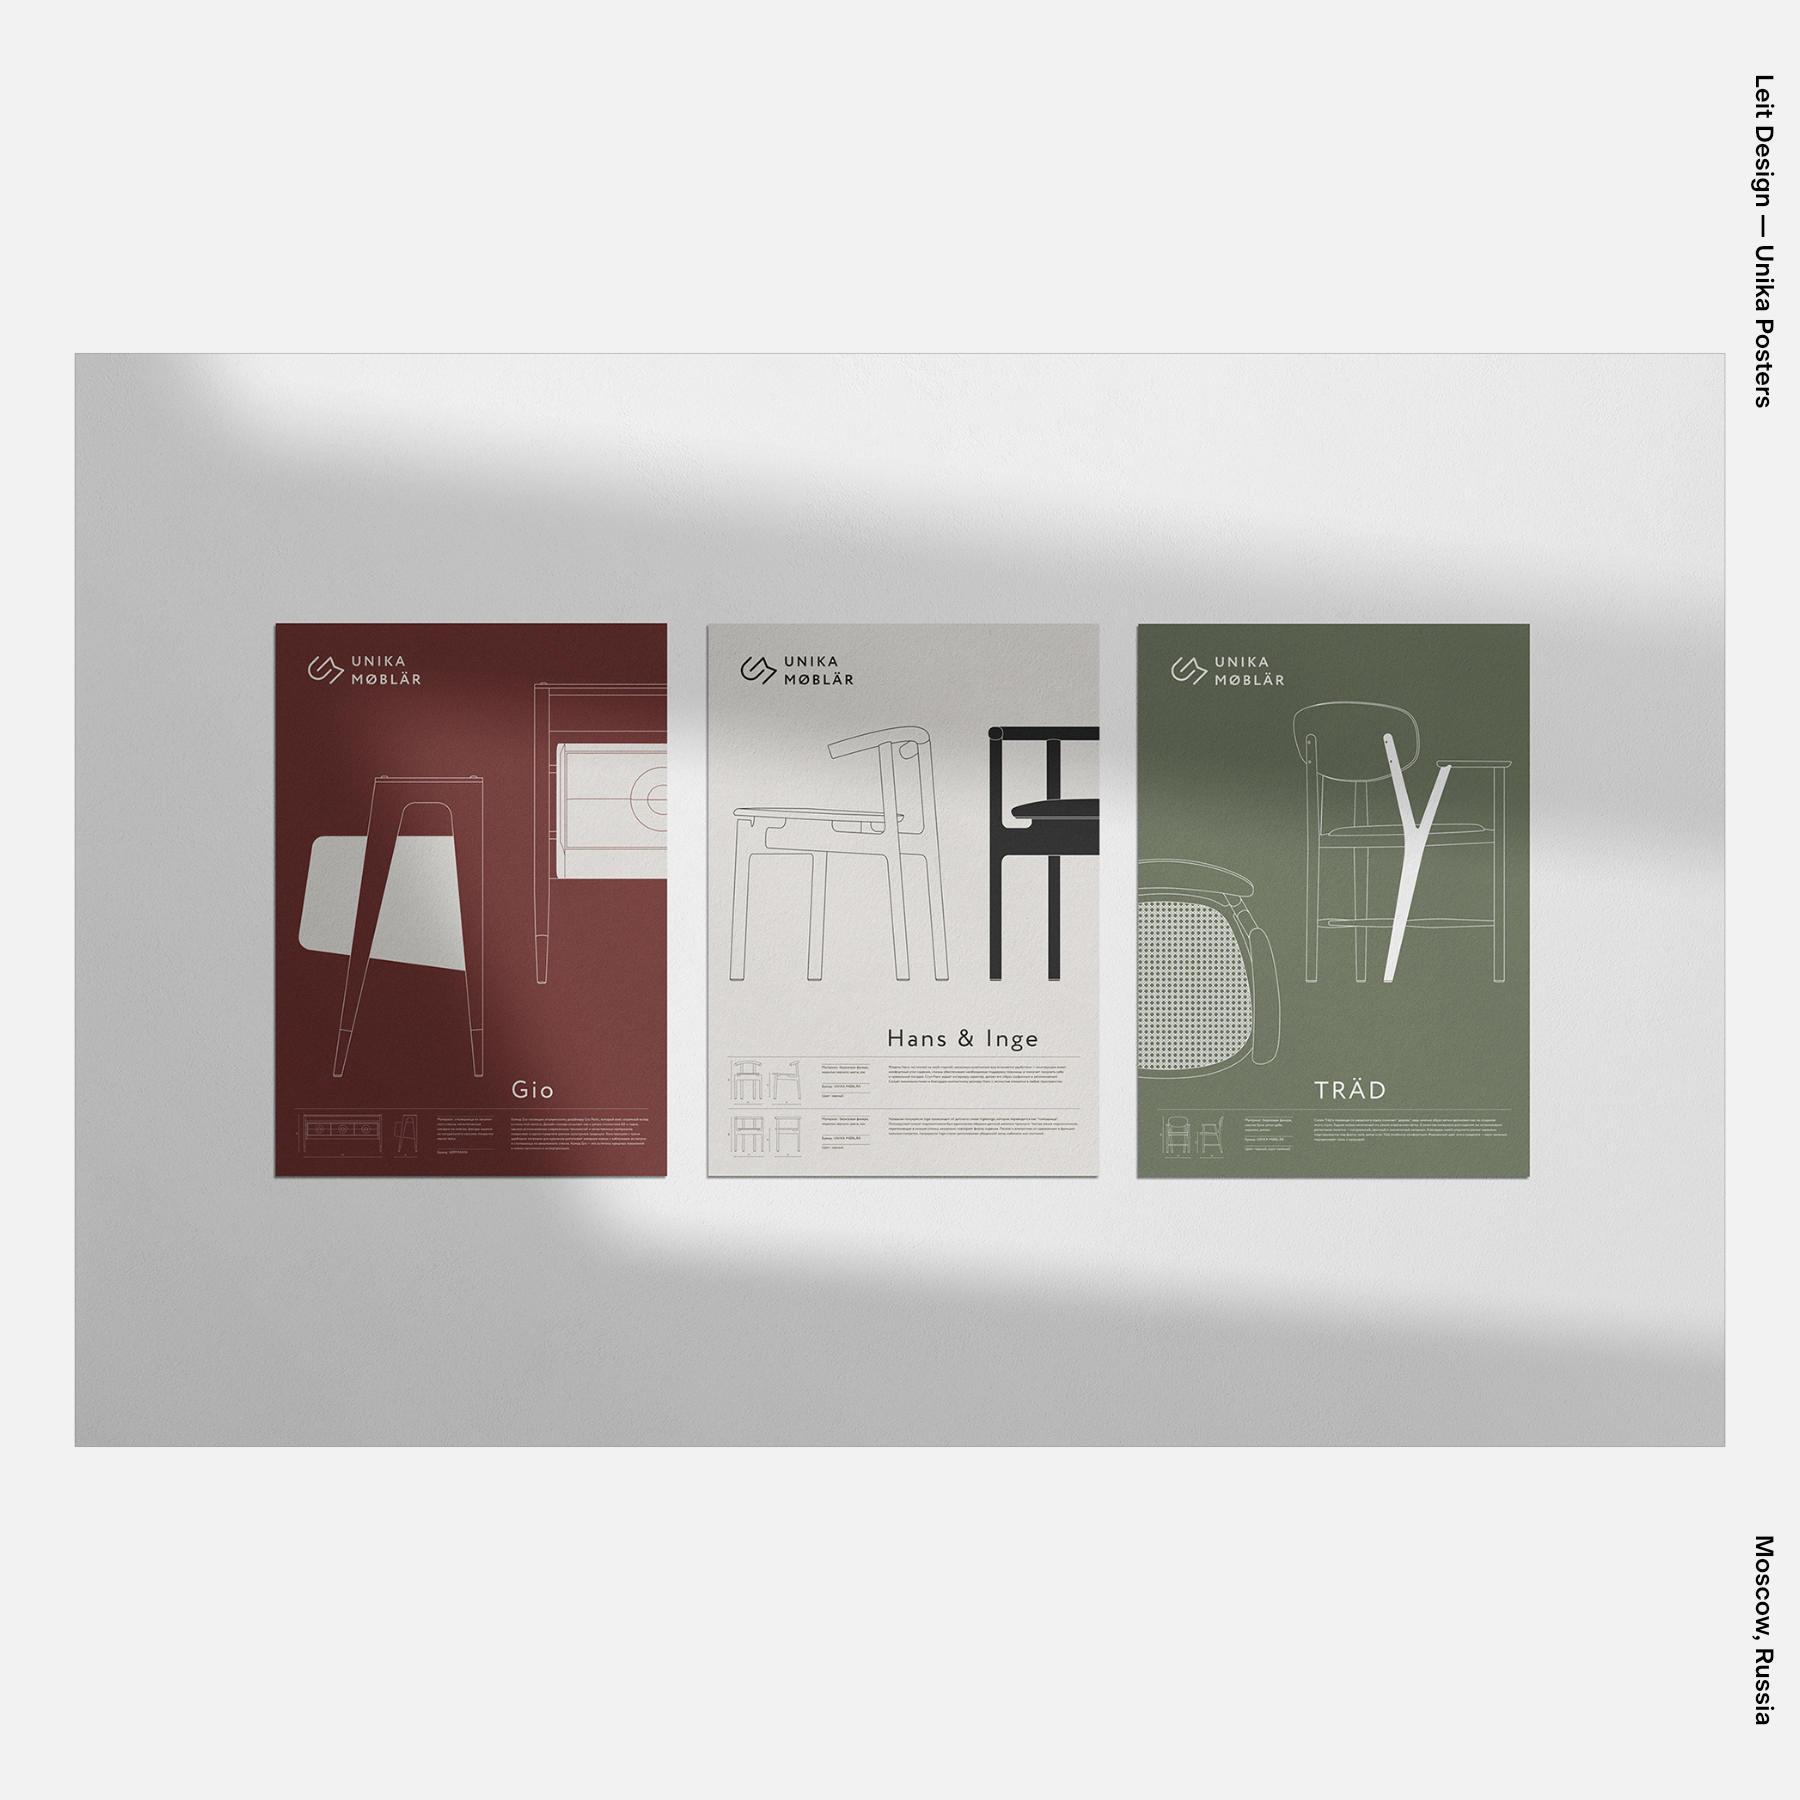 Leit Design — Unika Posters